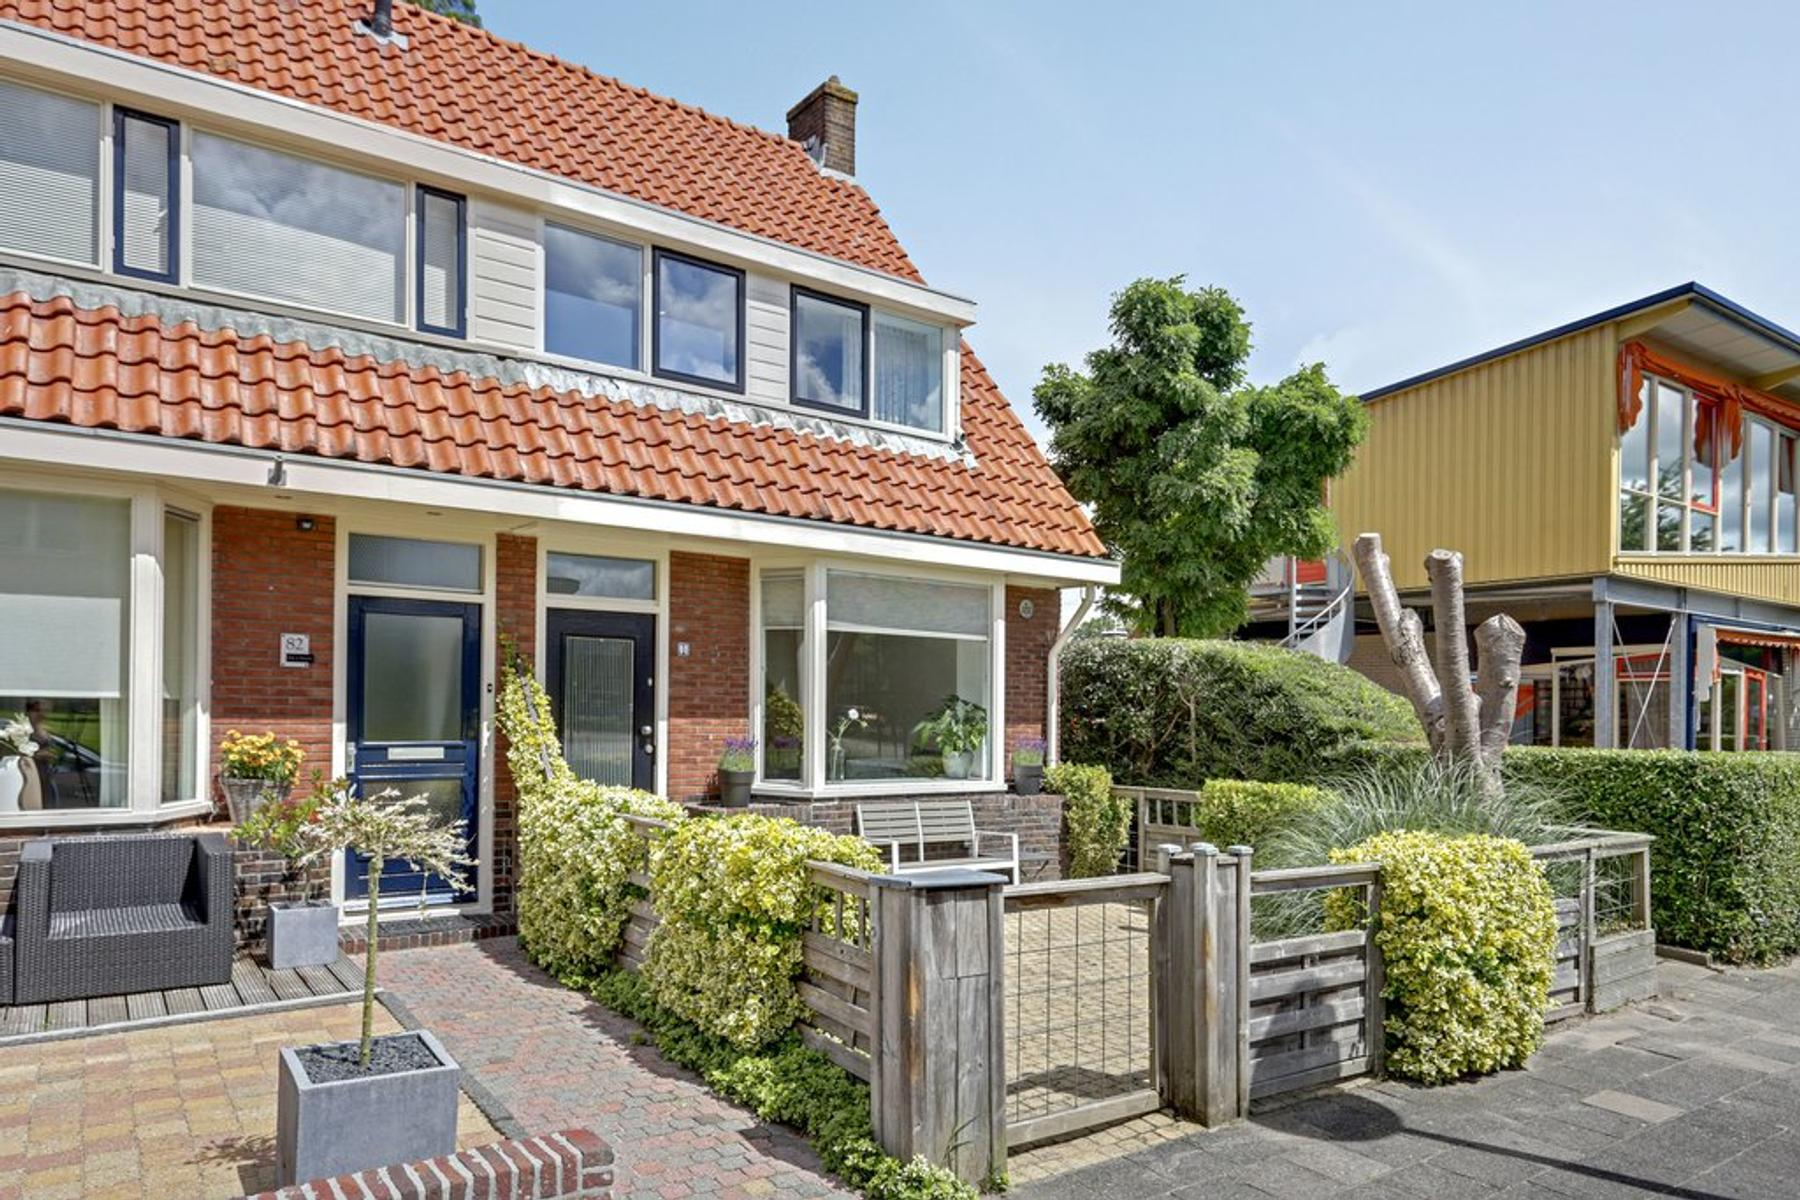 Marnixstraat 80. 8913 GZ Leeuwarden